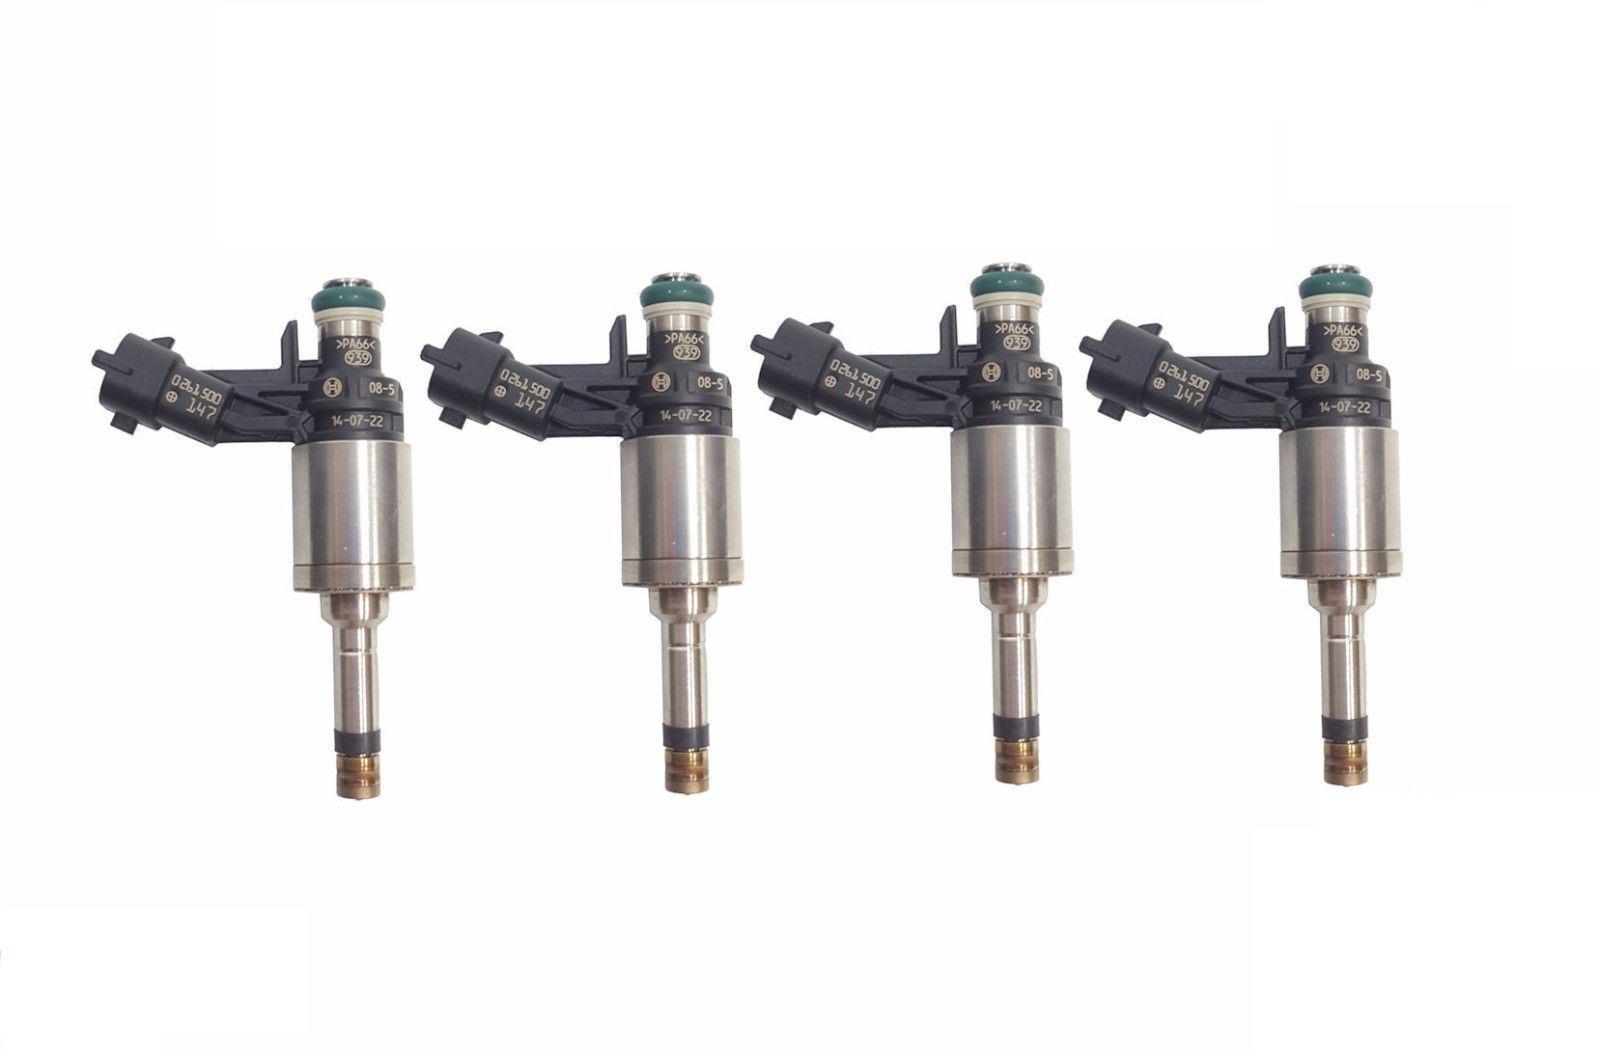 Land Rover Range Rover 2 0 Fuel Injector Petrol Bosch Eco